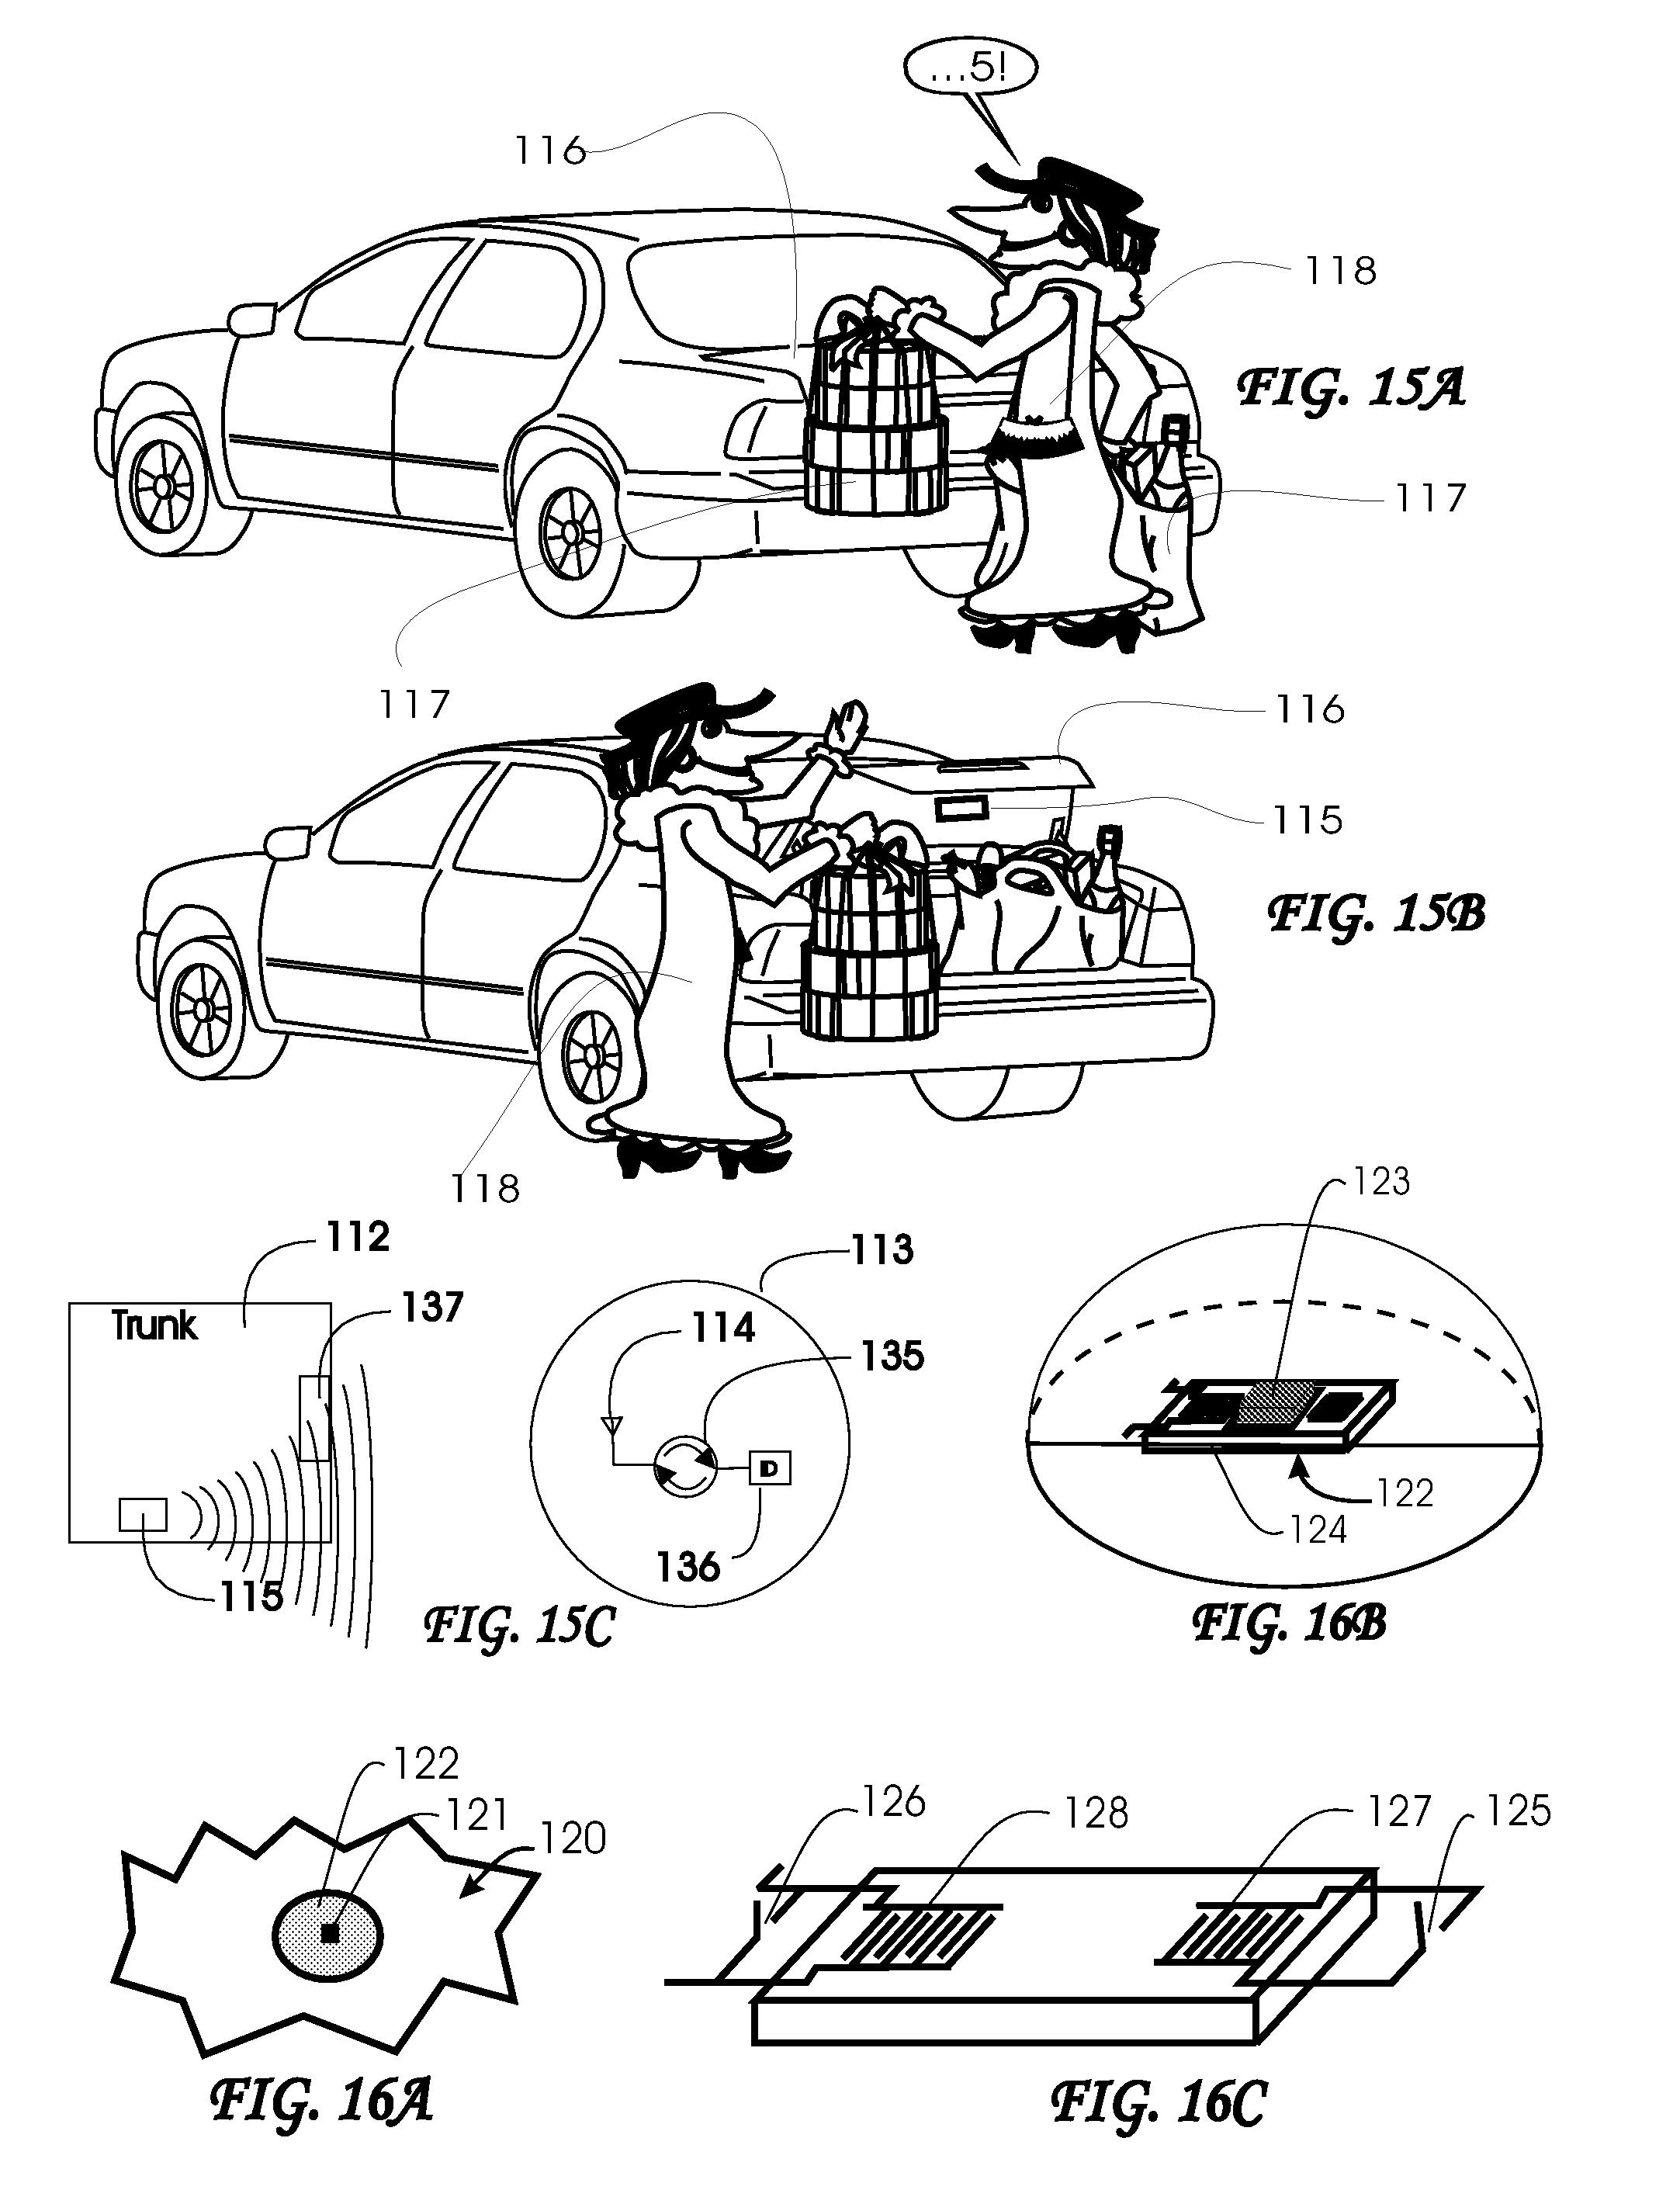 96 suburban wiring diagram  96  get free image about